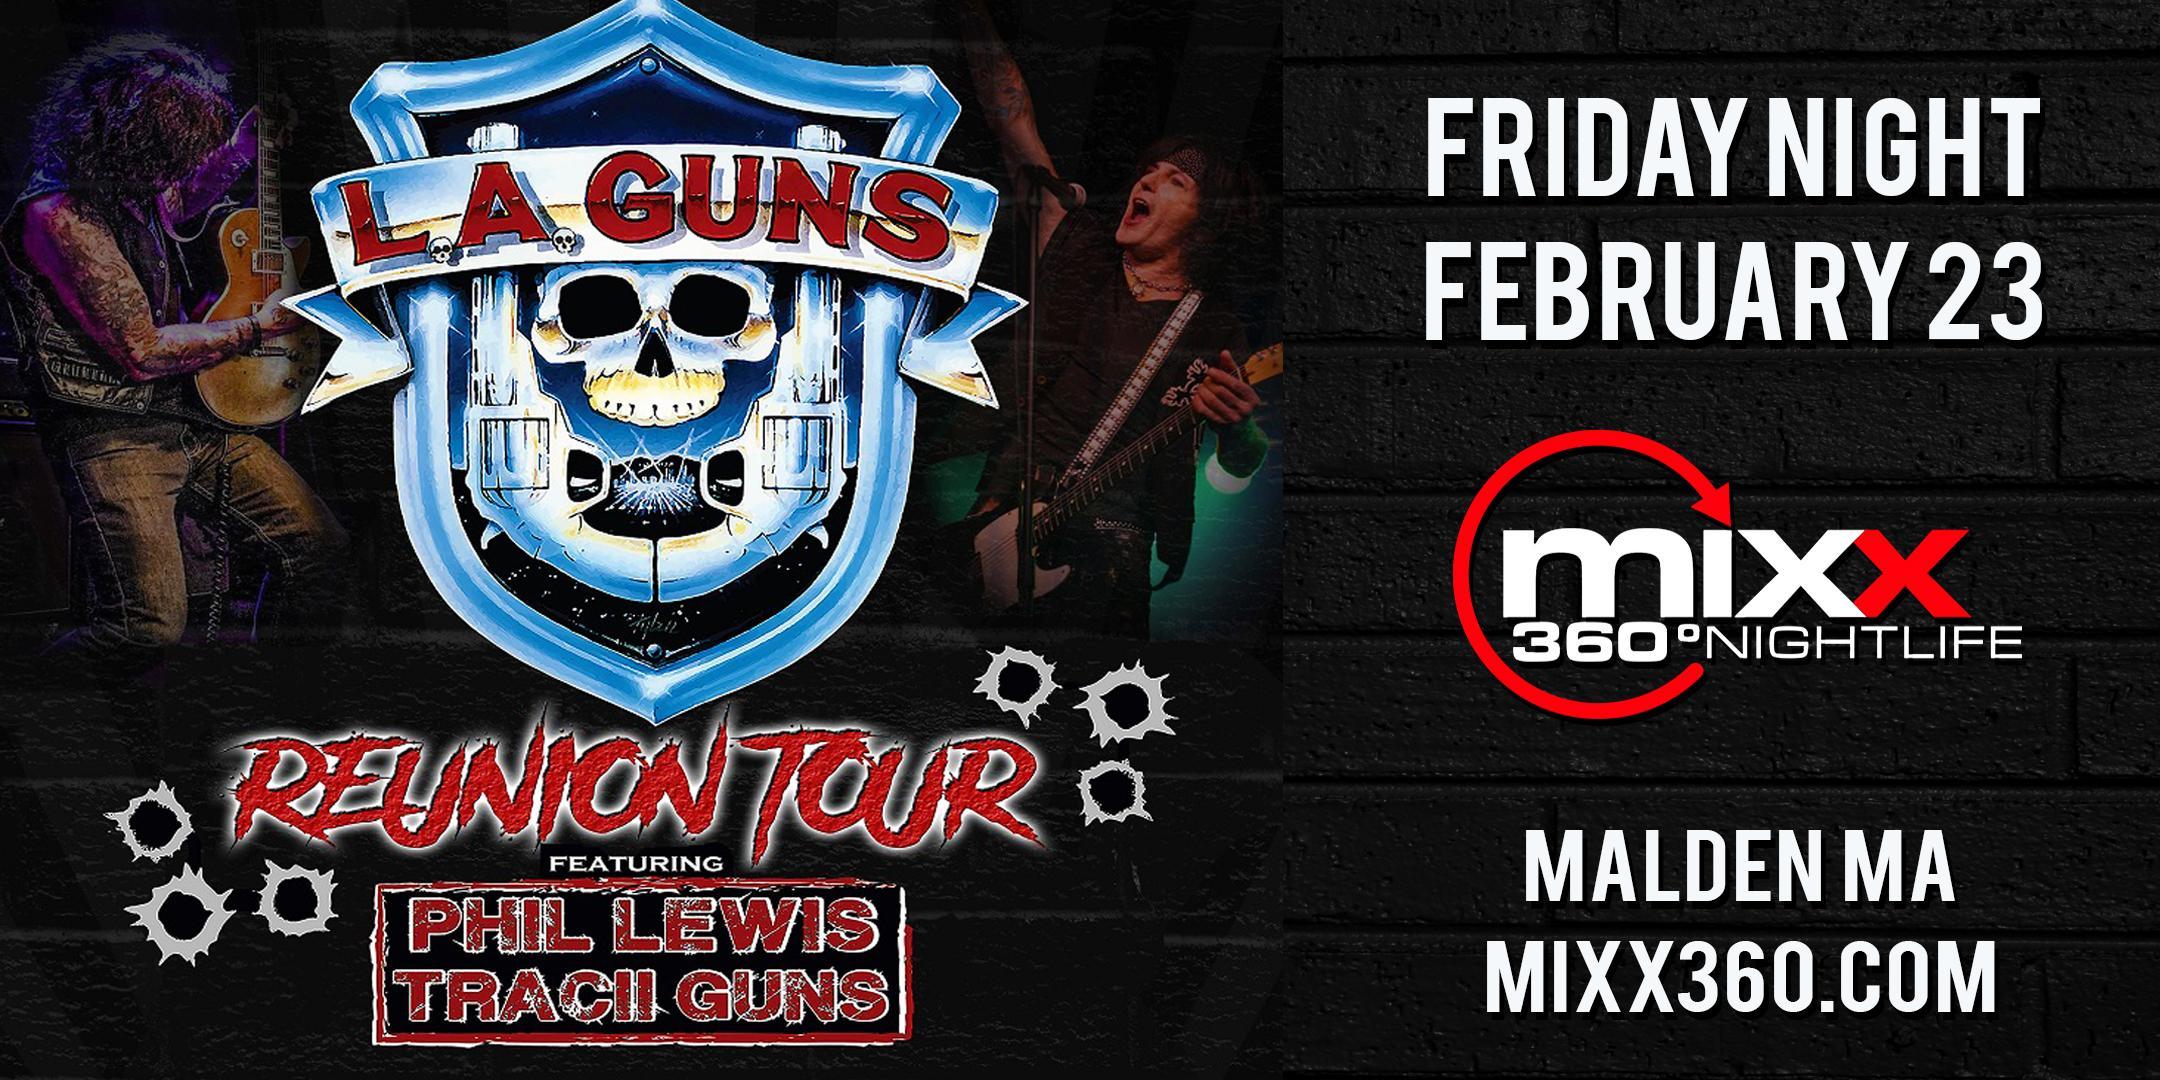 Mixx 360 presents L.A. GUNS REUNION